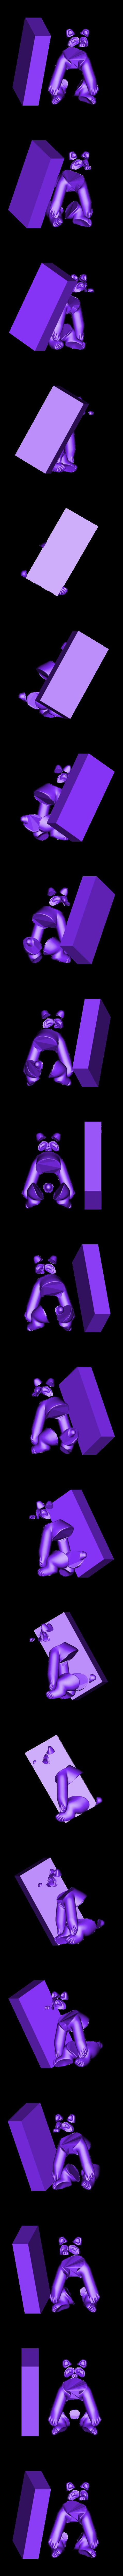 pandablack.stl Download free STL file Panda • Model to 3D print, yourwildworld